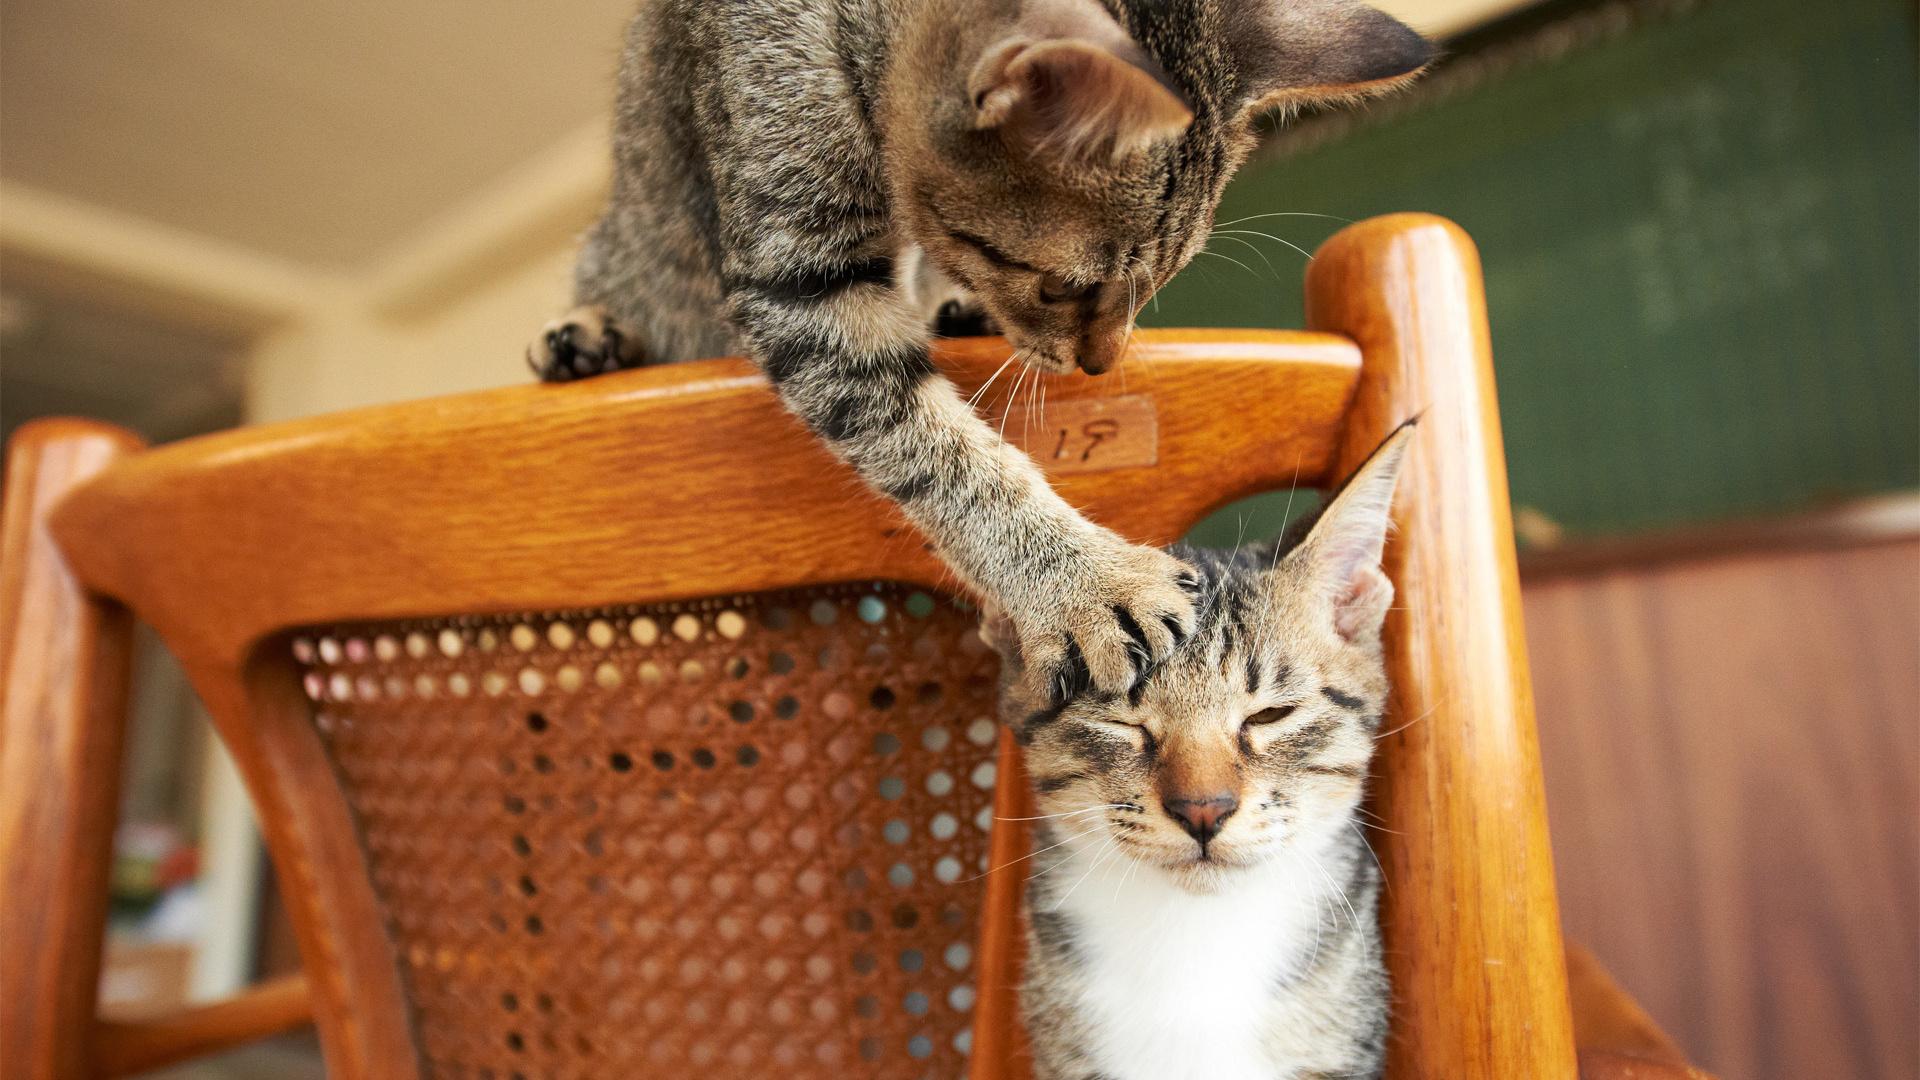 Картинки с кошками веселые